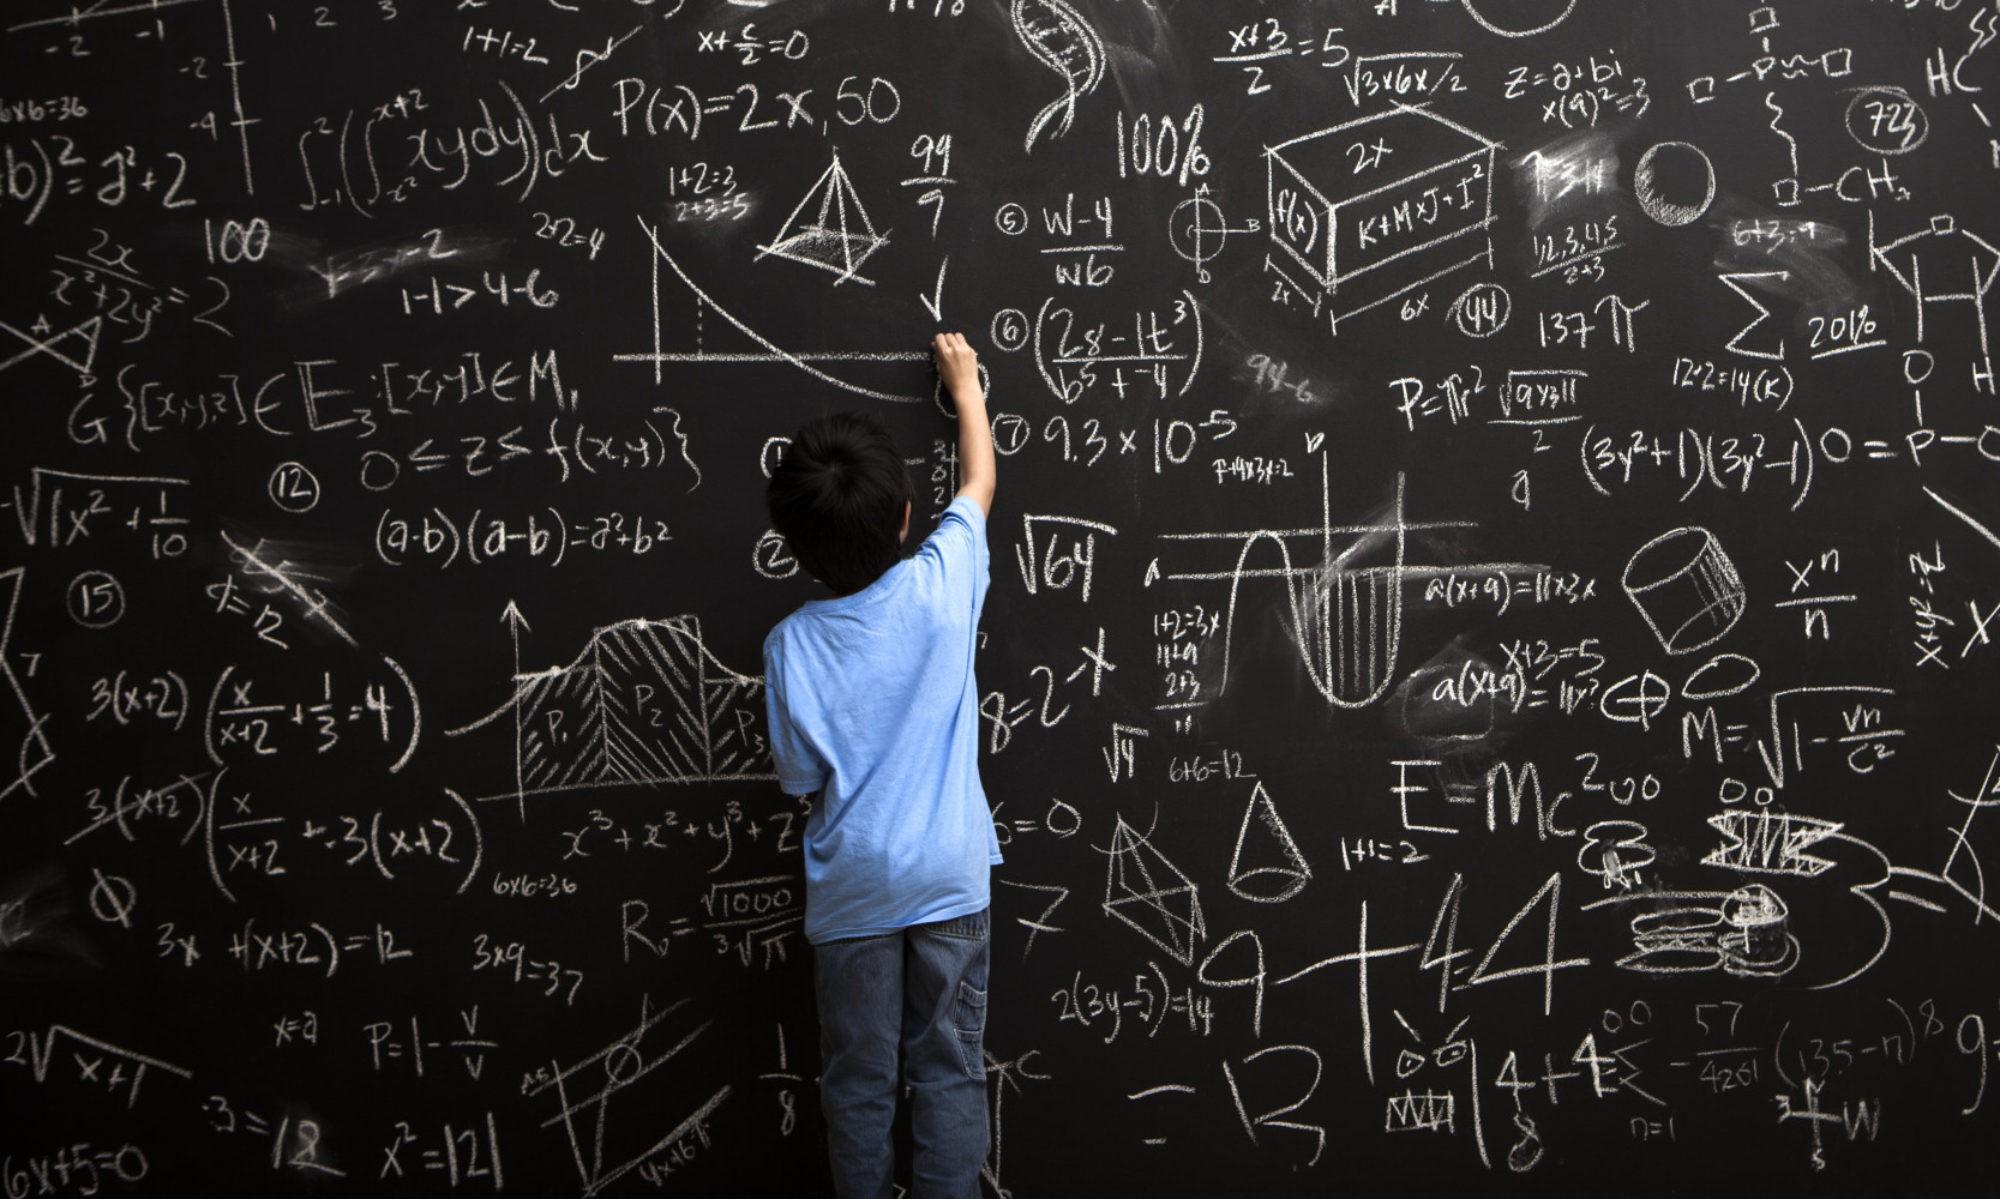 matematik_önyargı_matematiksel